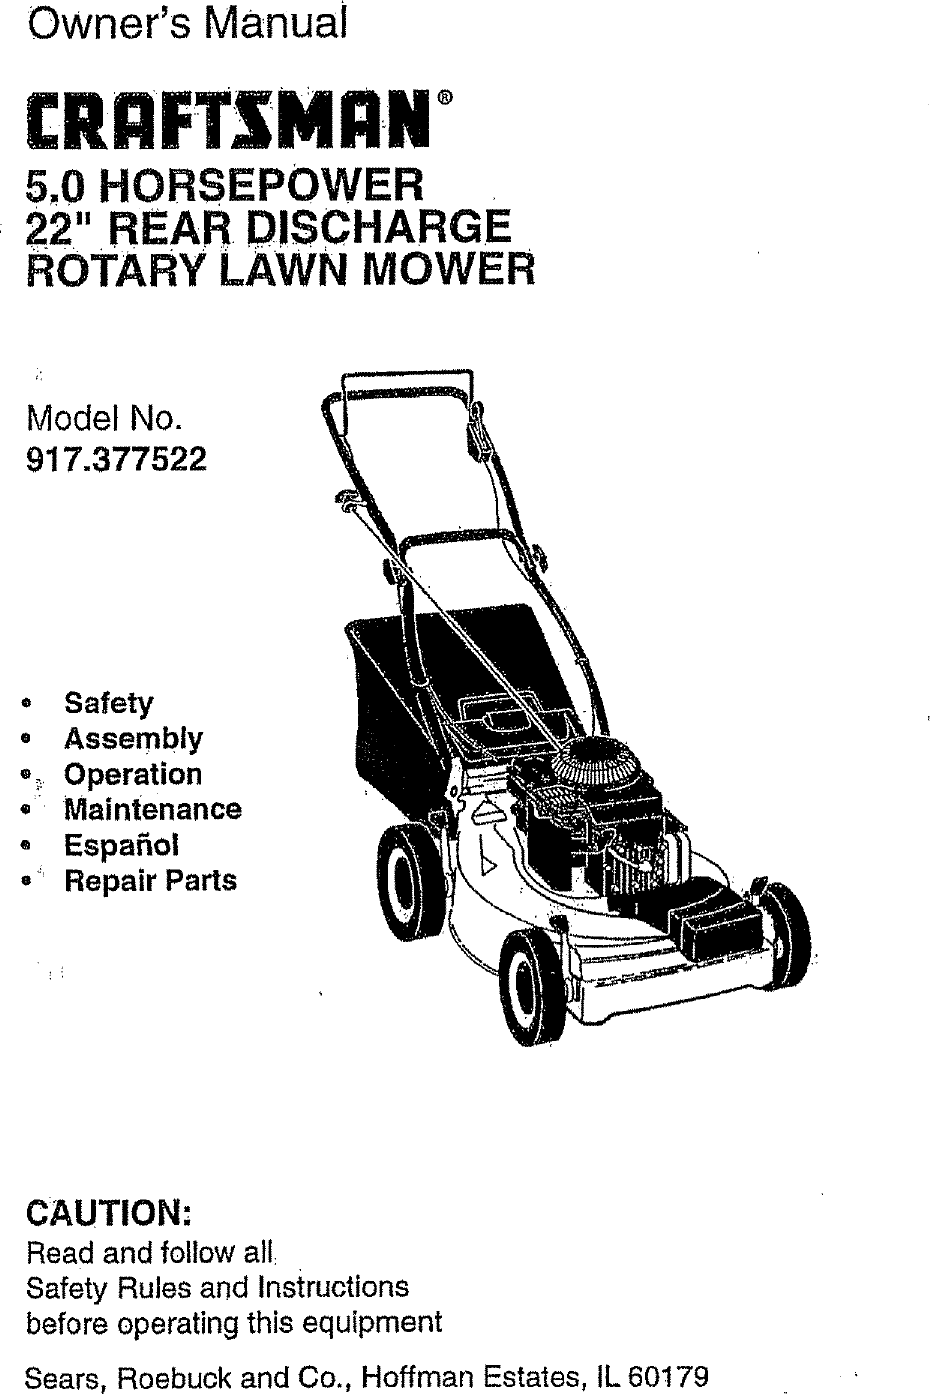 Craftsman 917377522 User Manual ROTARY MOWER Manuals And